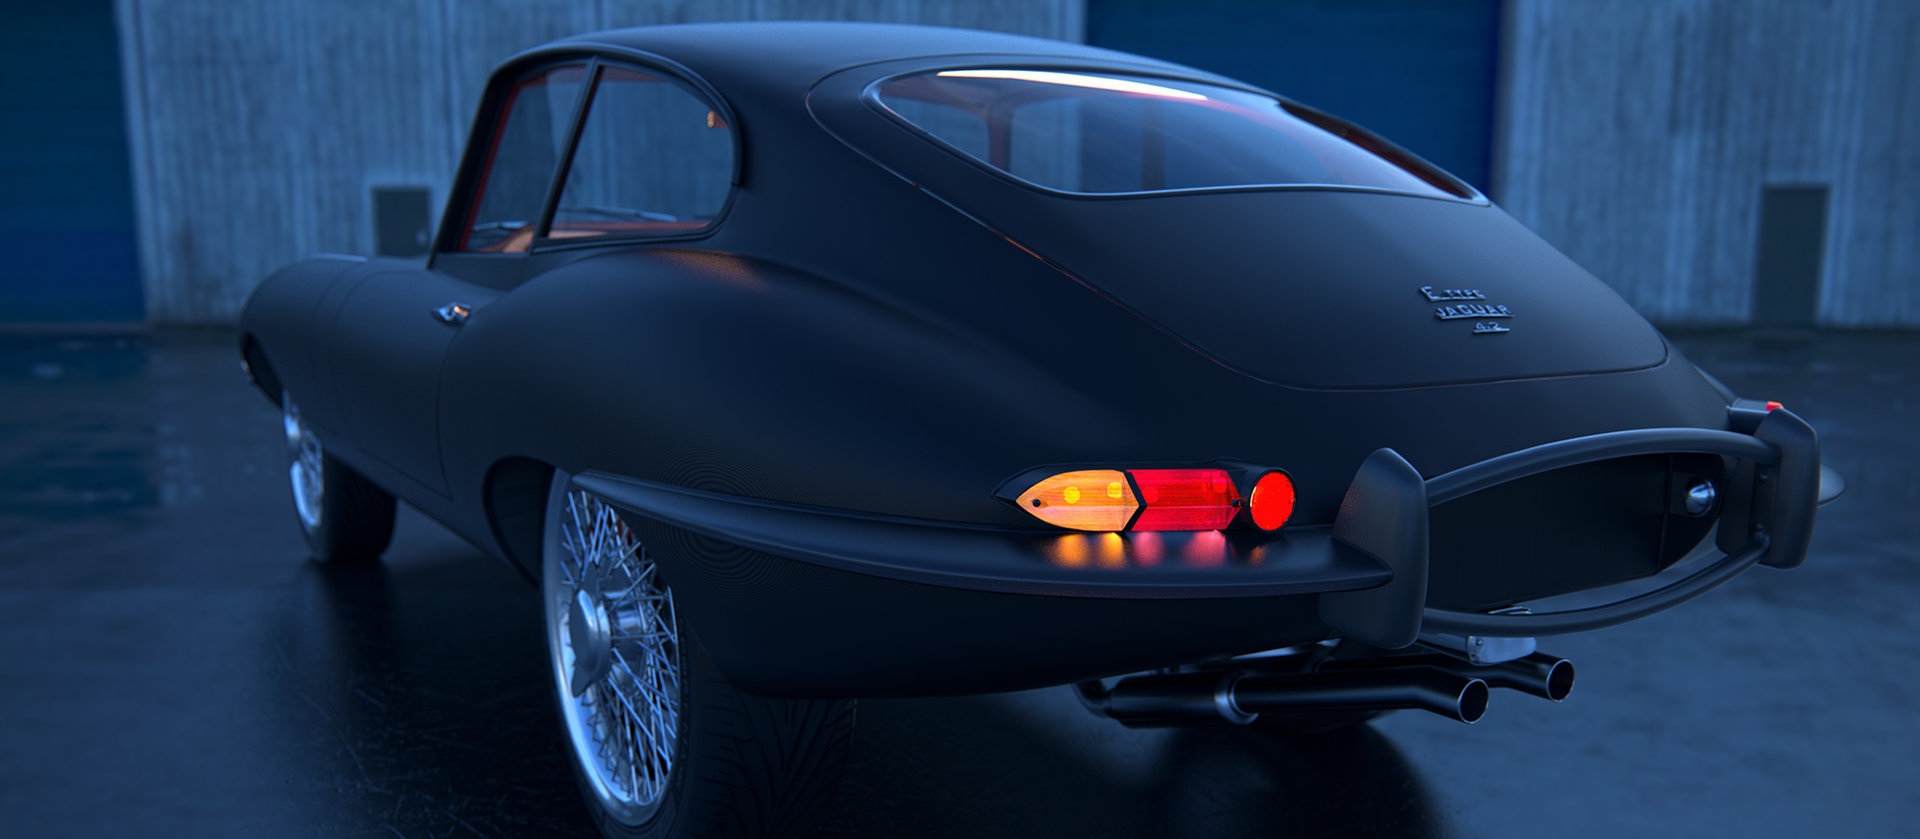 Michael marcondes blkup05 jaguar 1961 e type s1 3